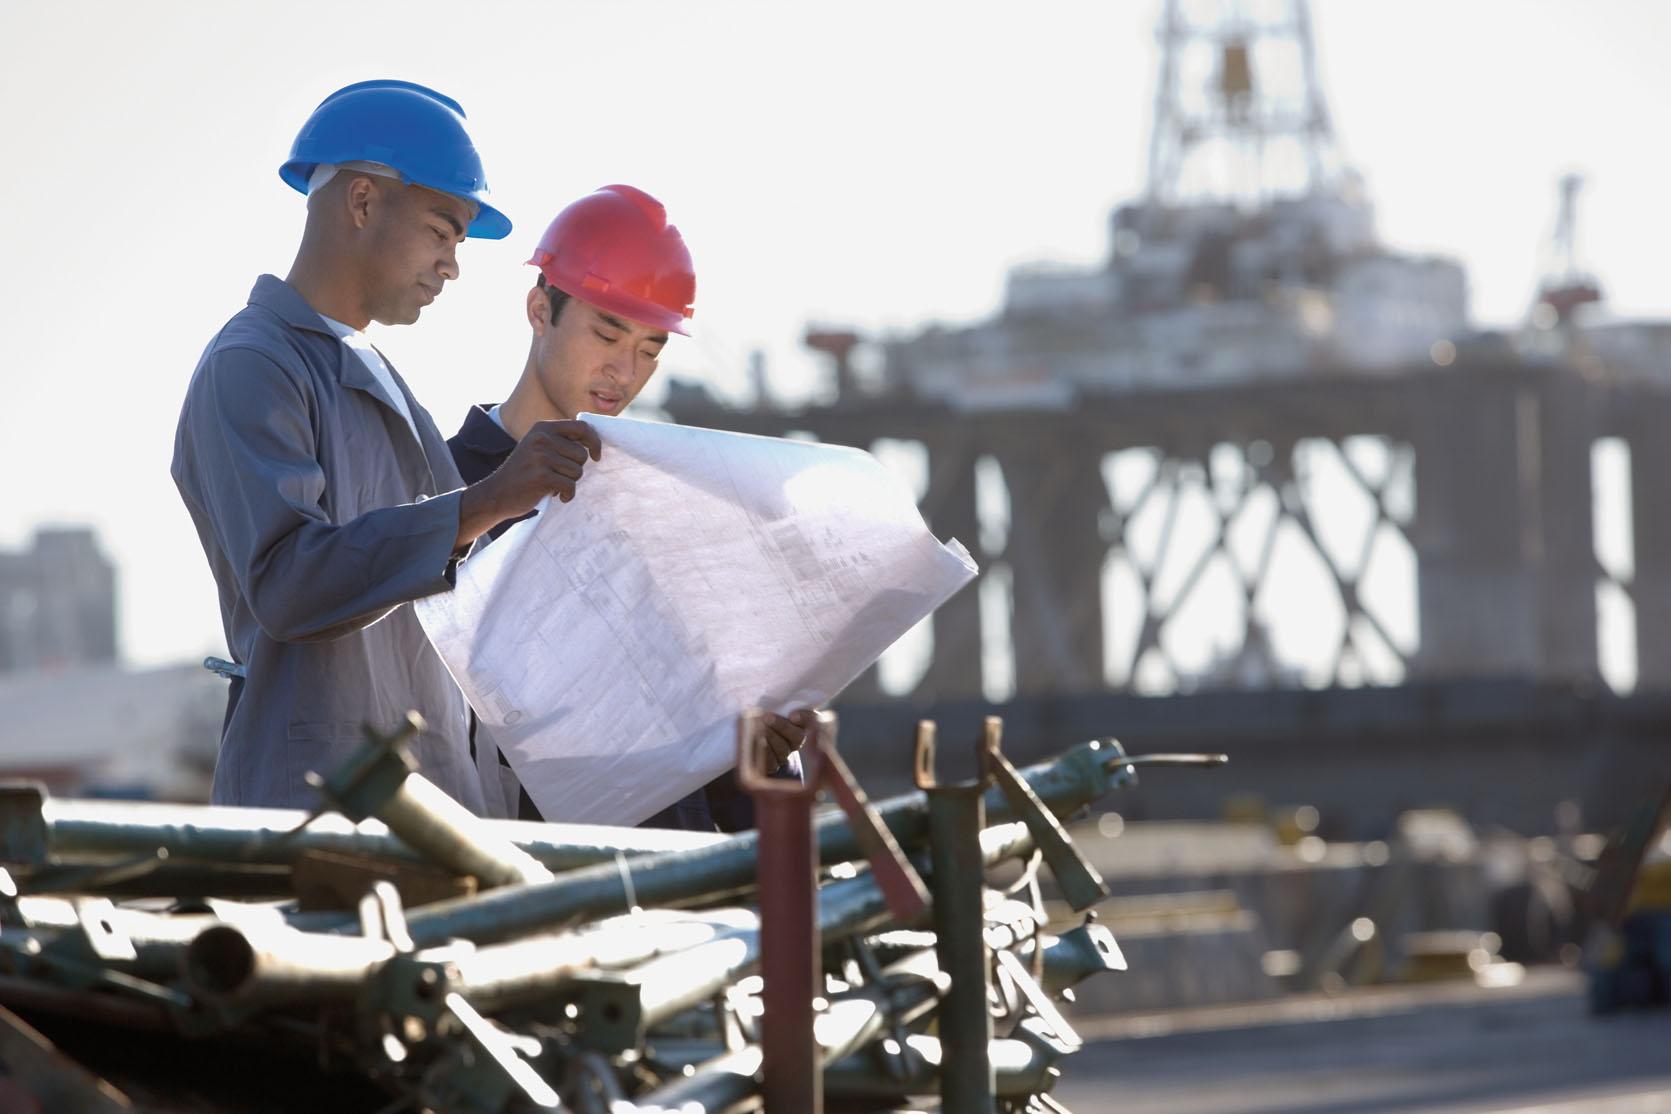 Hays Oil & Gas Global Job